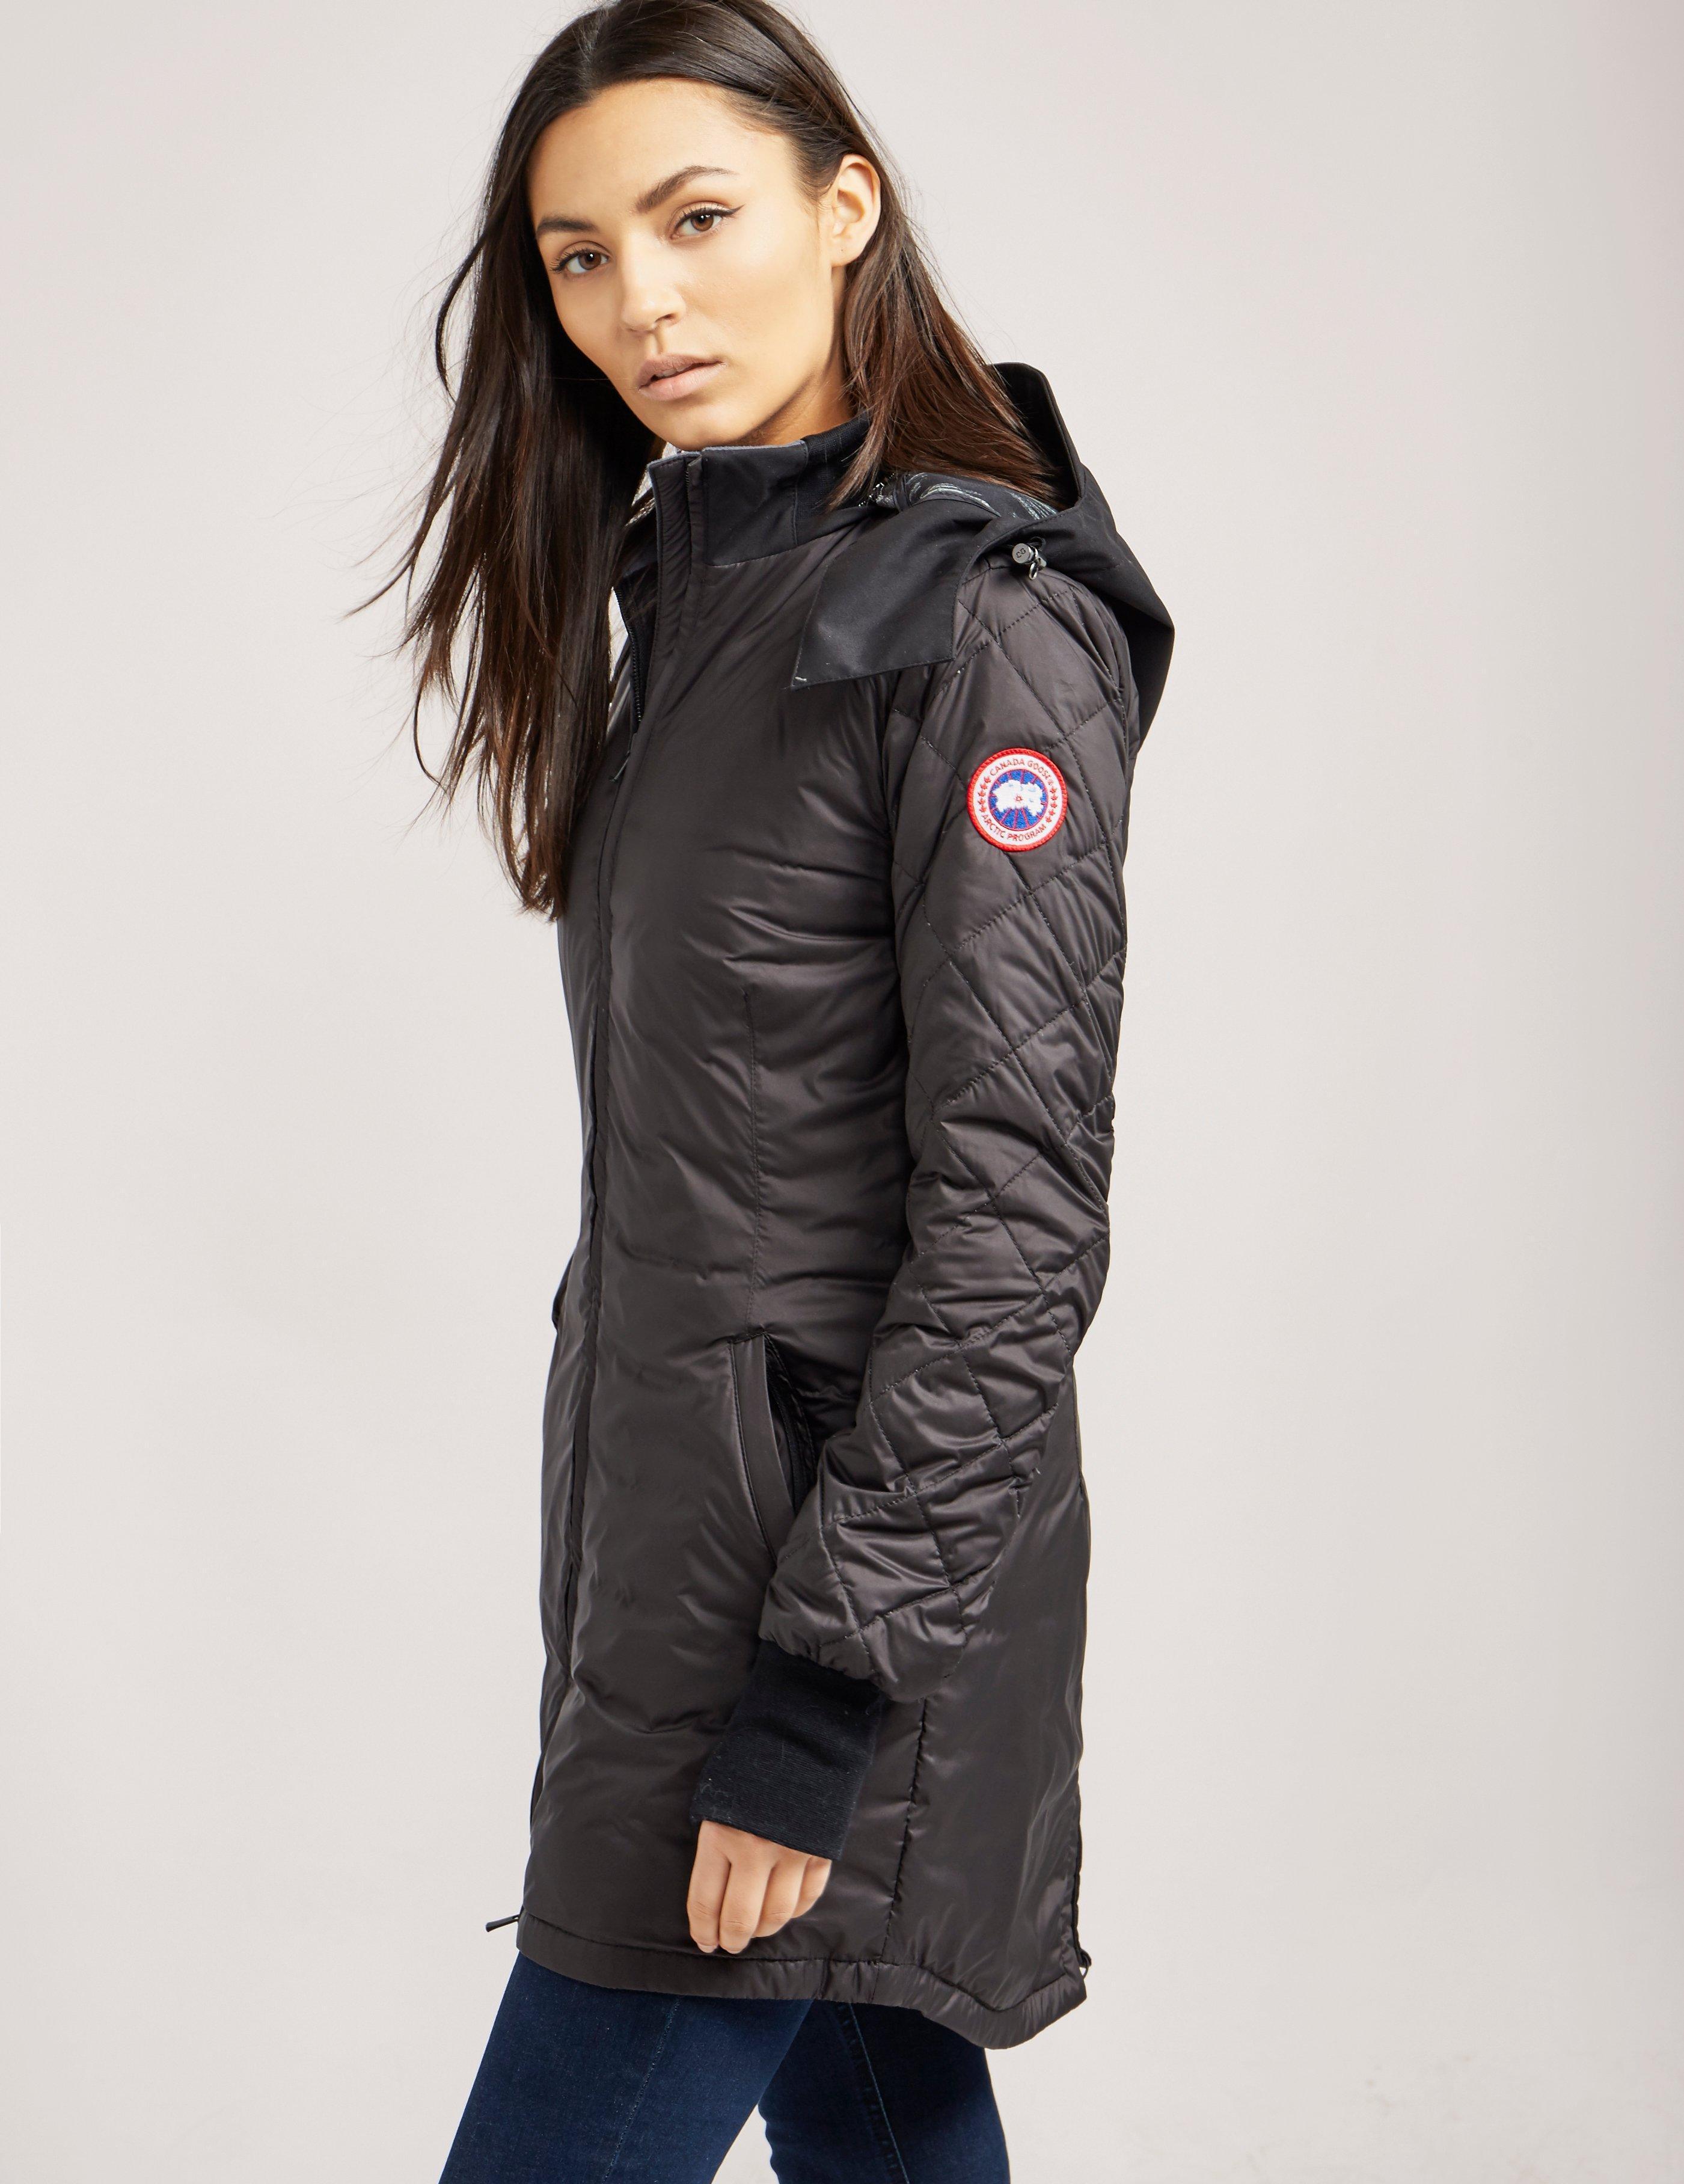 Canada goose coat for women